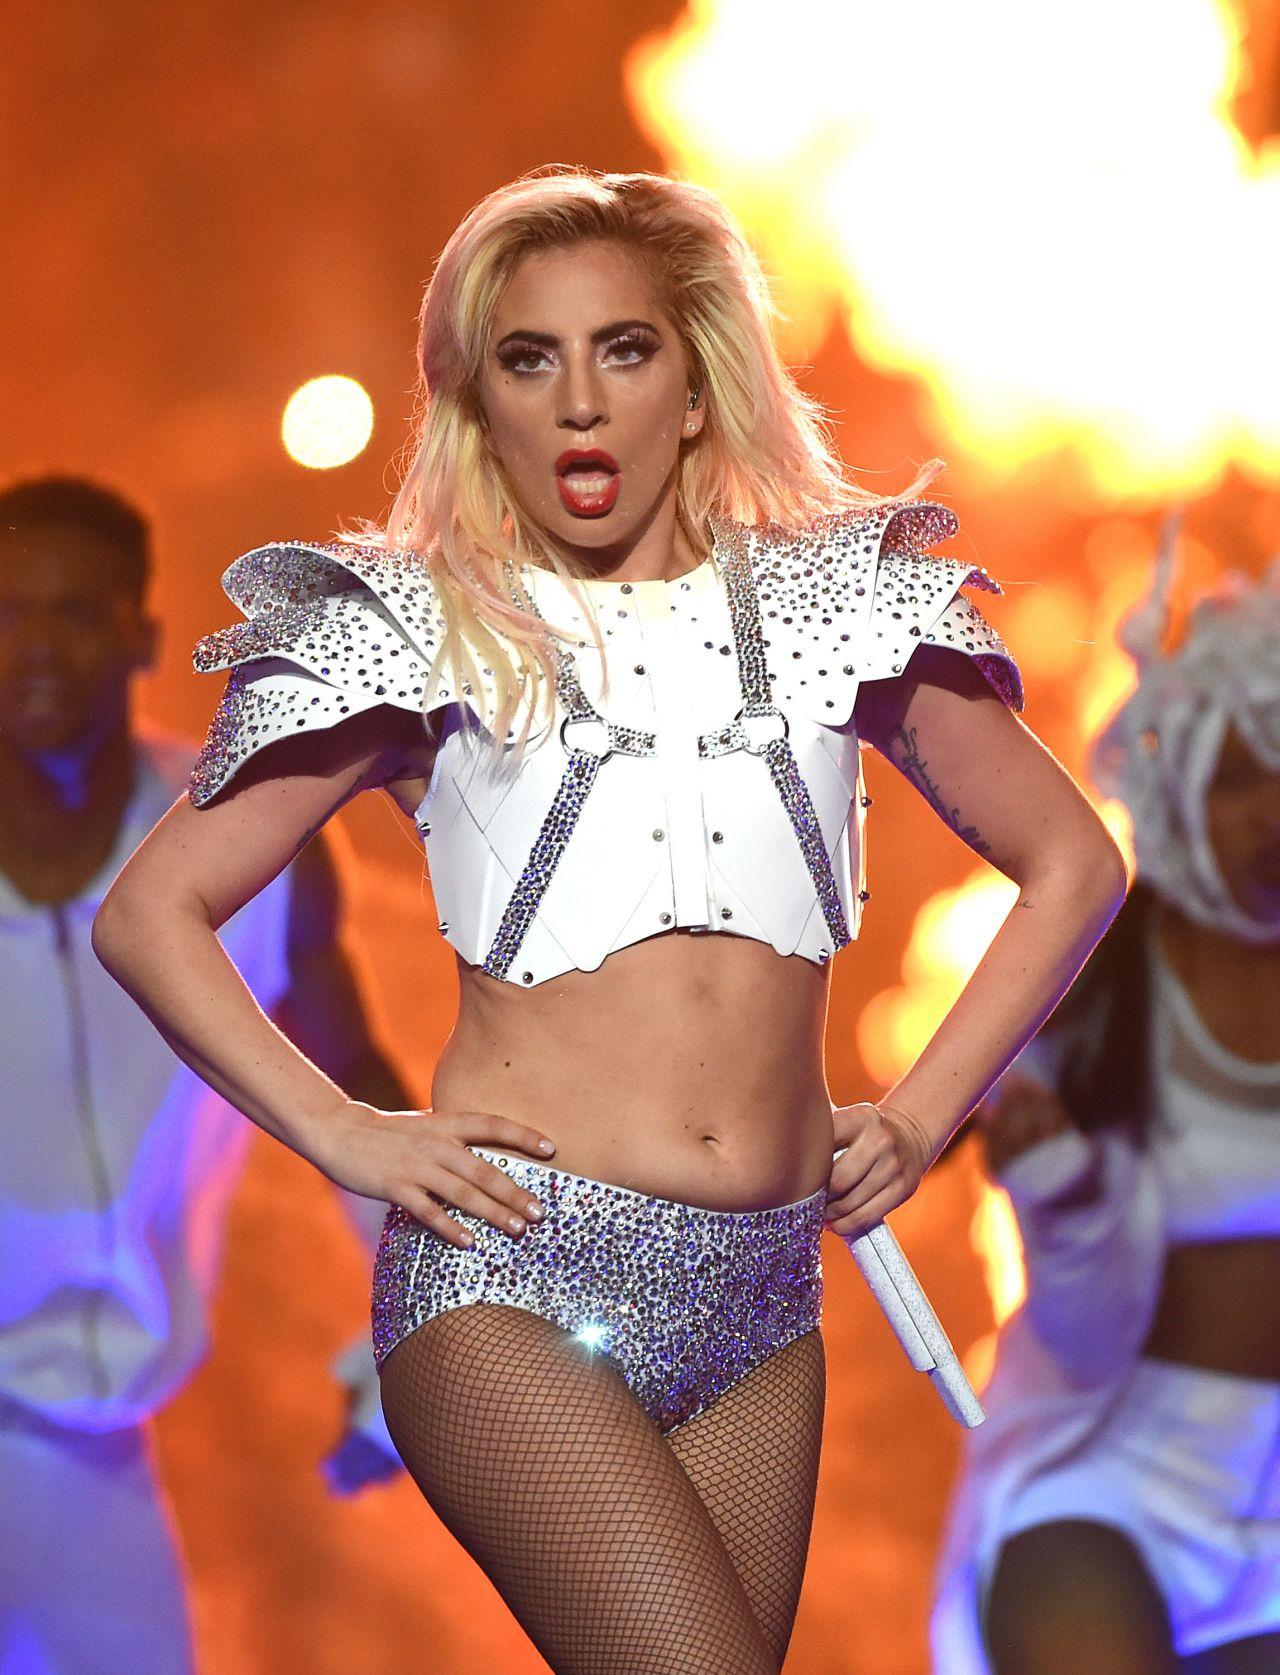 Lady Gaga - Super Bowl LI Halftime Show in Houston, Texas 2/5/ 2017